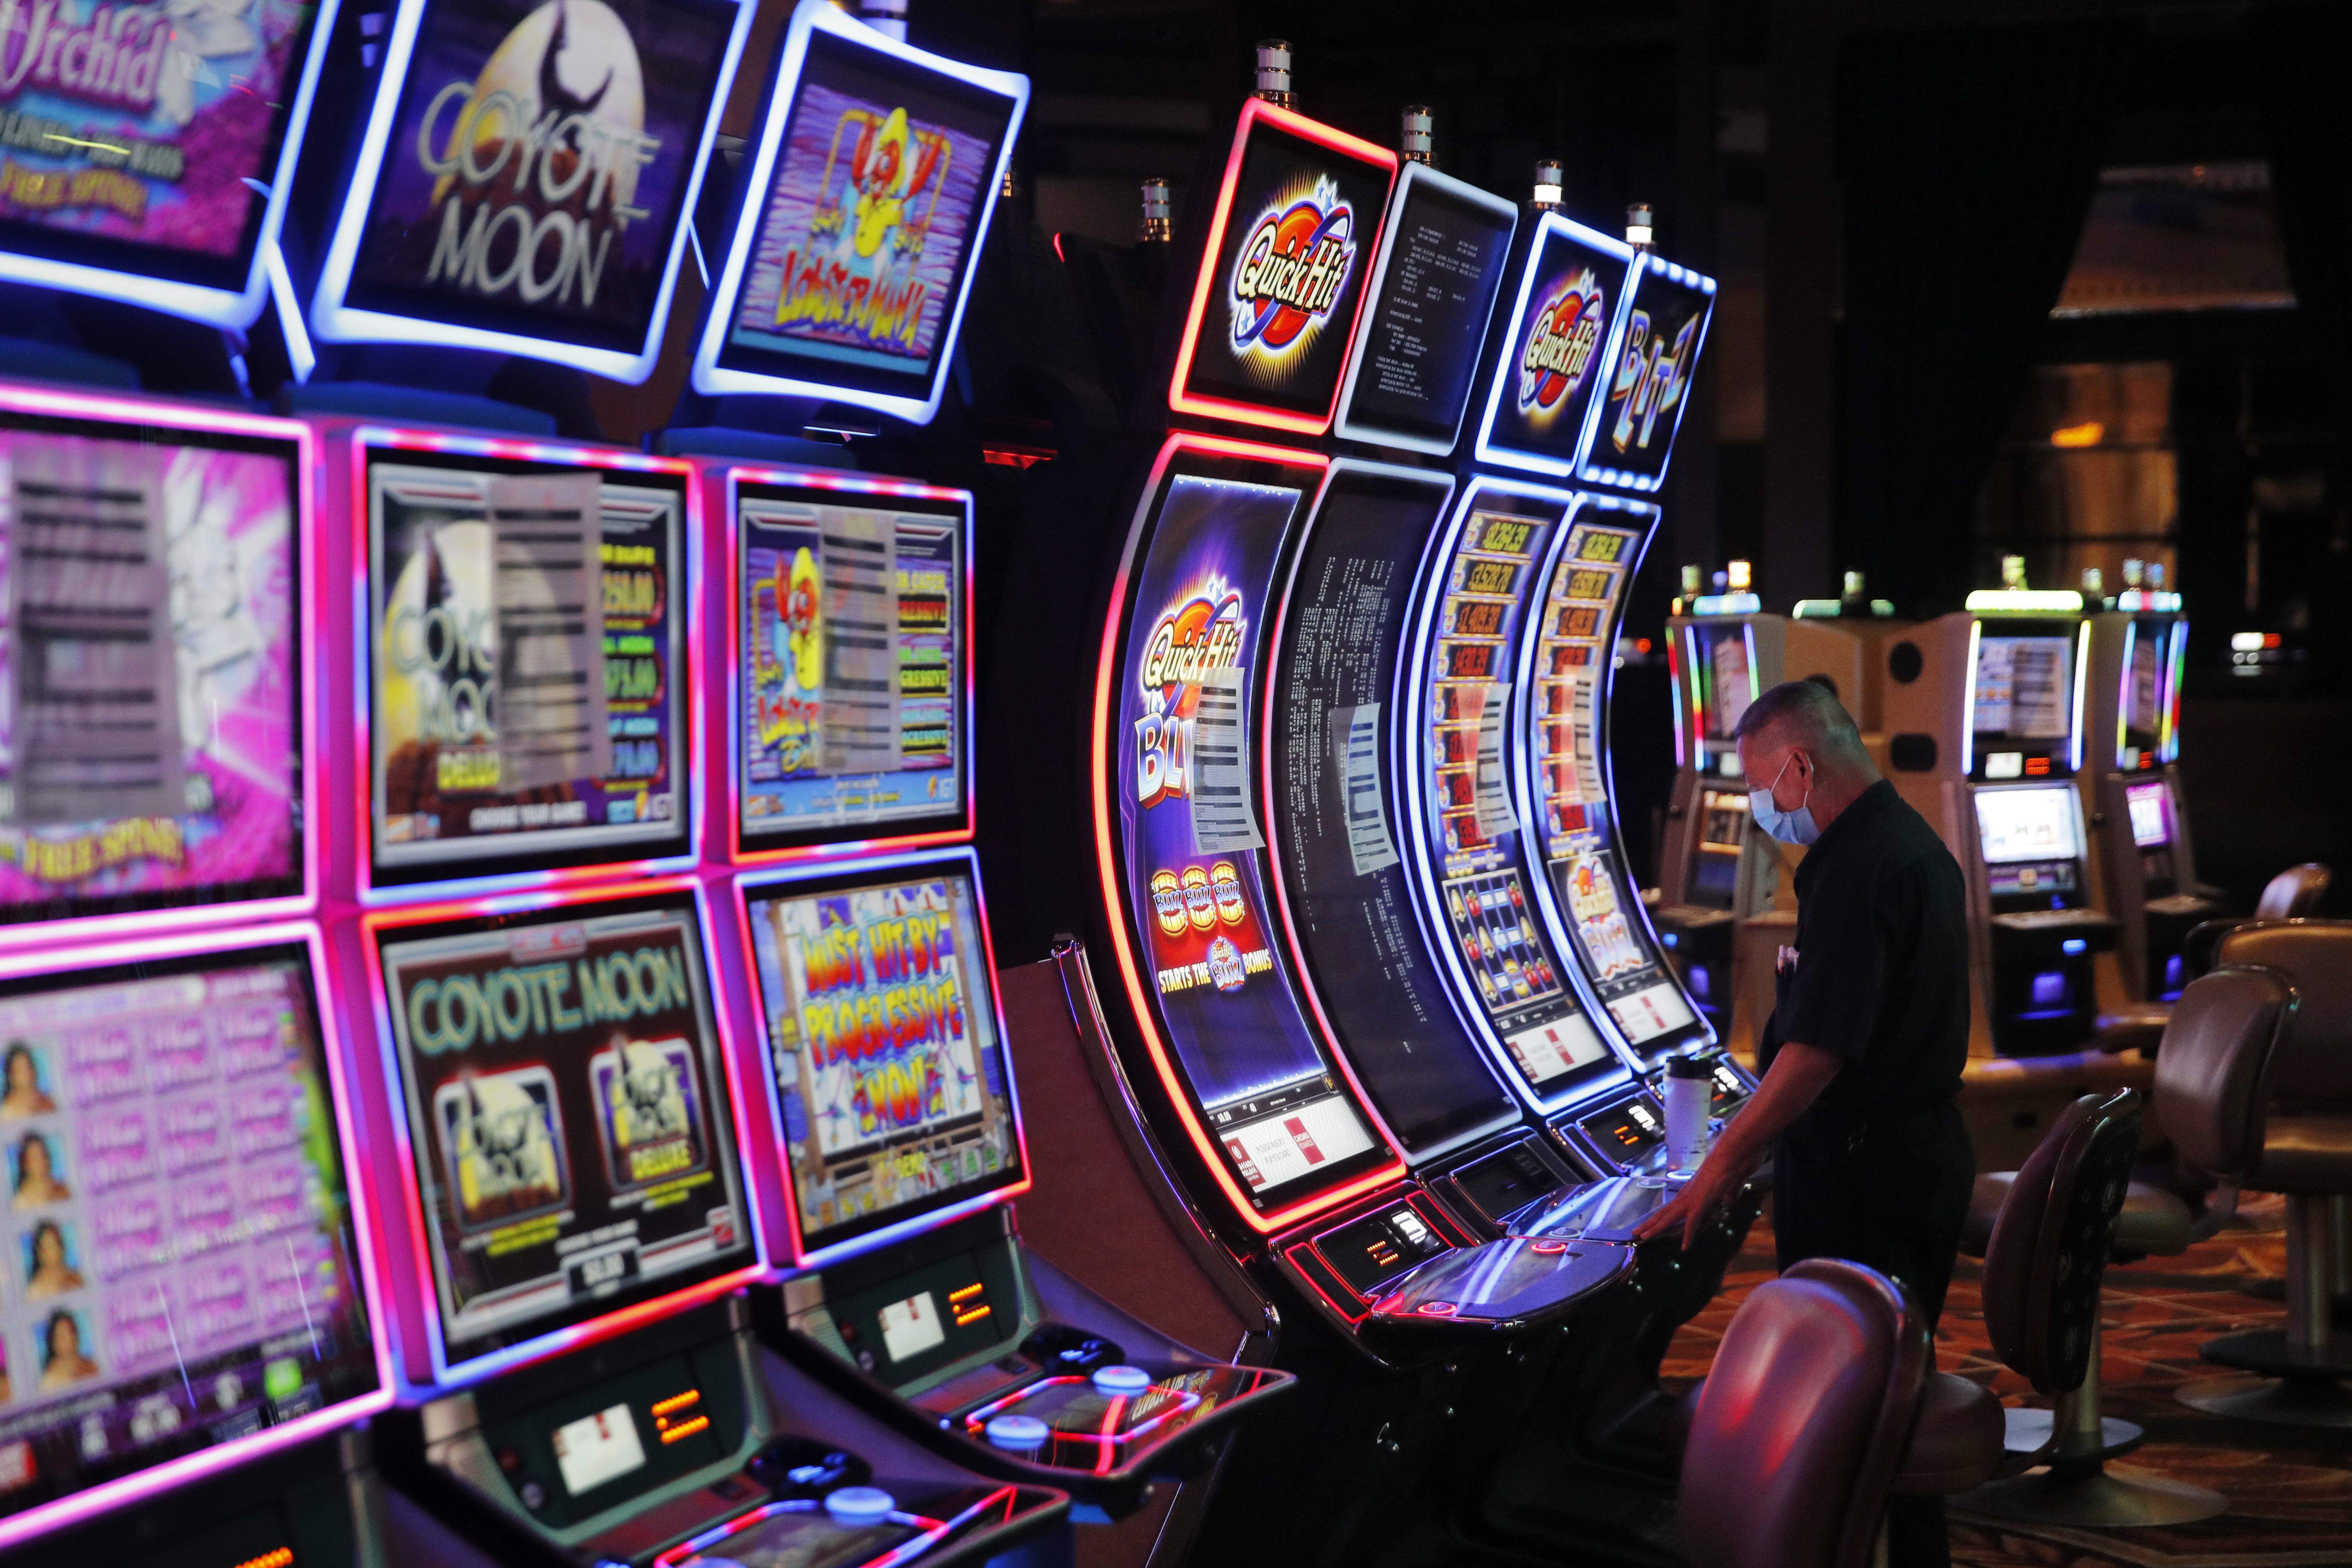 Casino in nevada game cacing 2